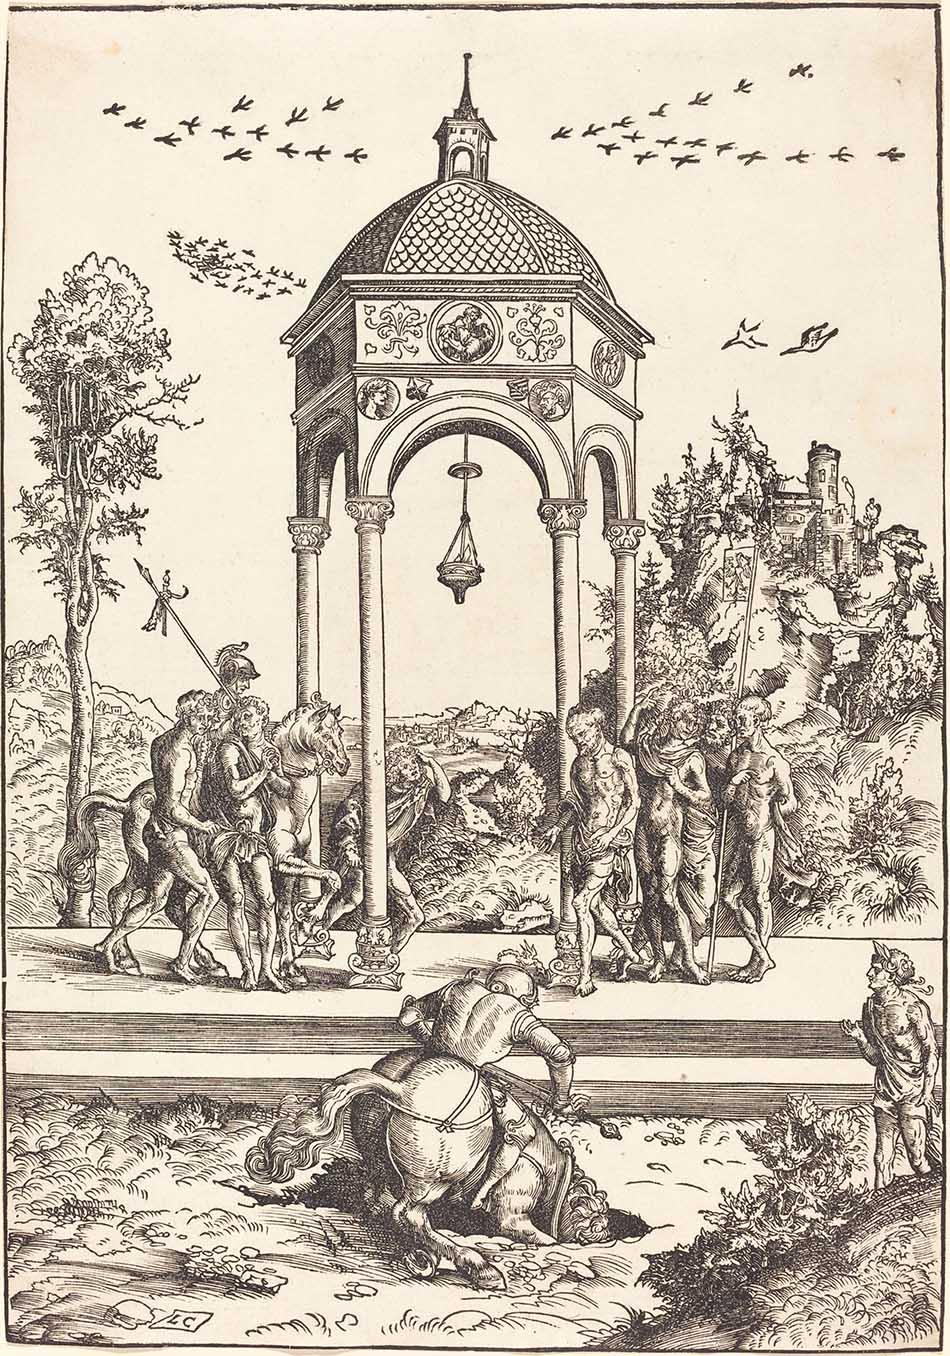 4969-033_lucas cranach the elder_marcus curtius plunging into the chasm